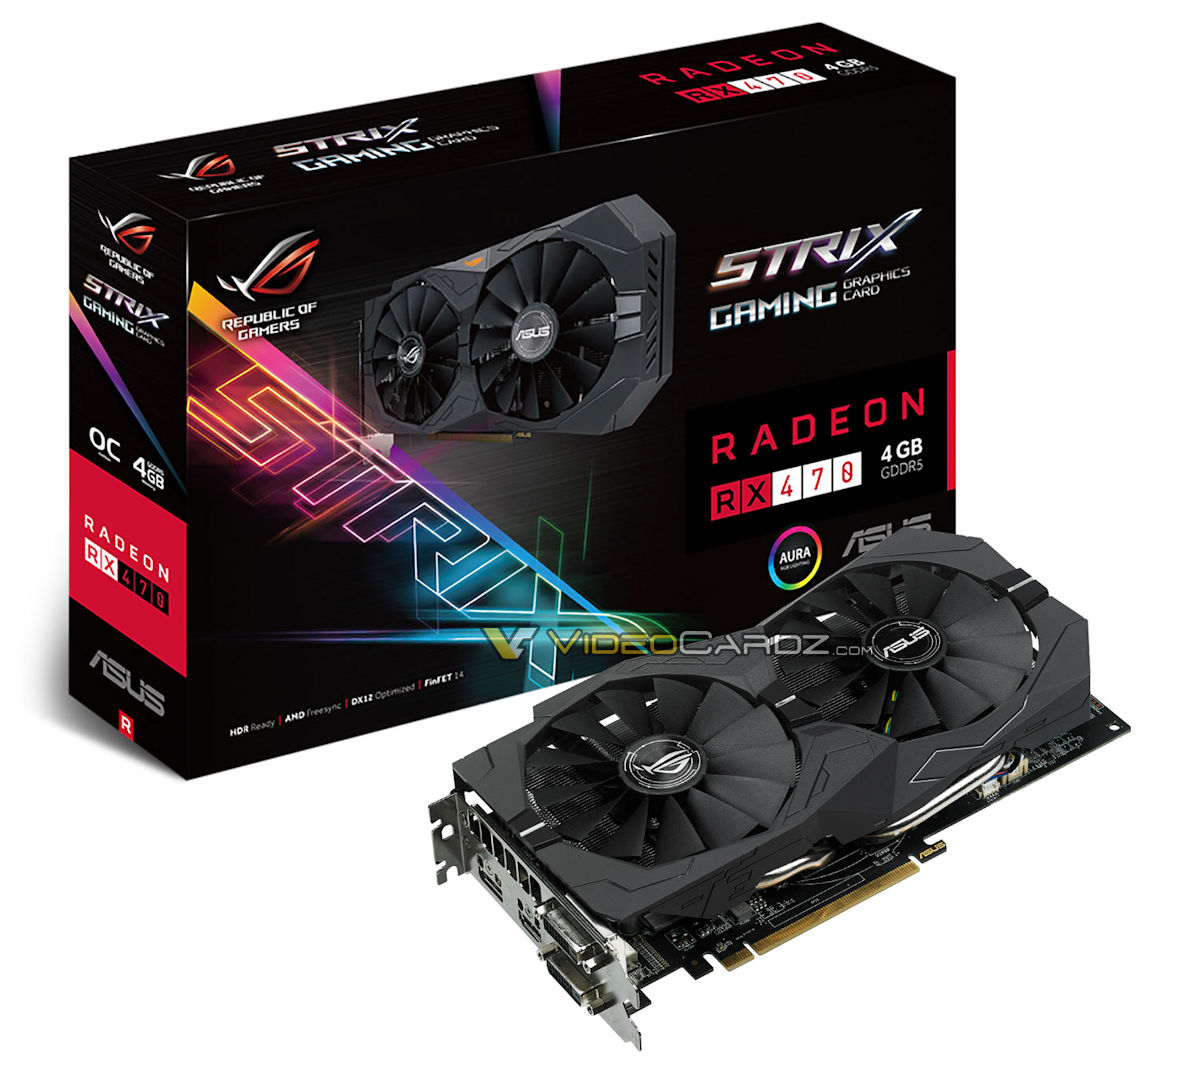 ASUS-Radeon-RX-470-STRIX